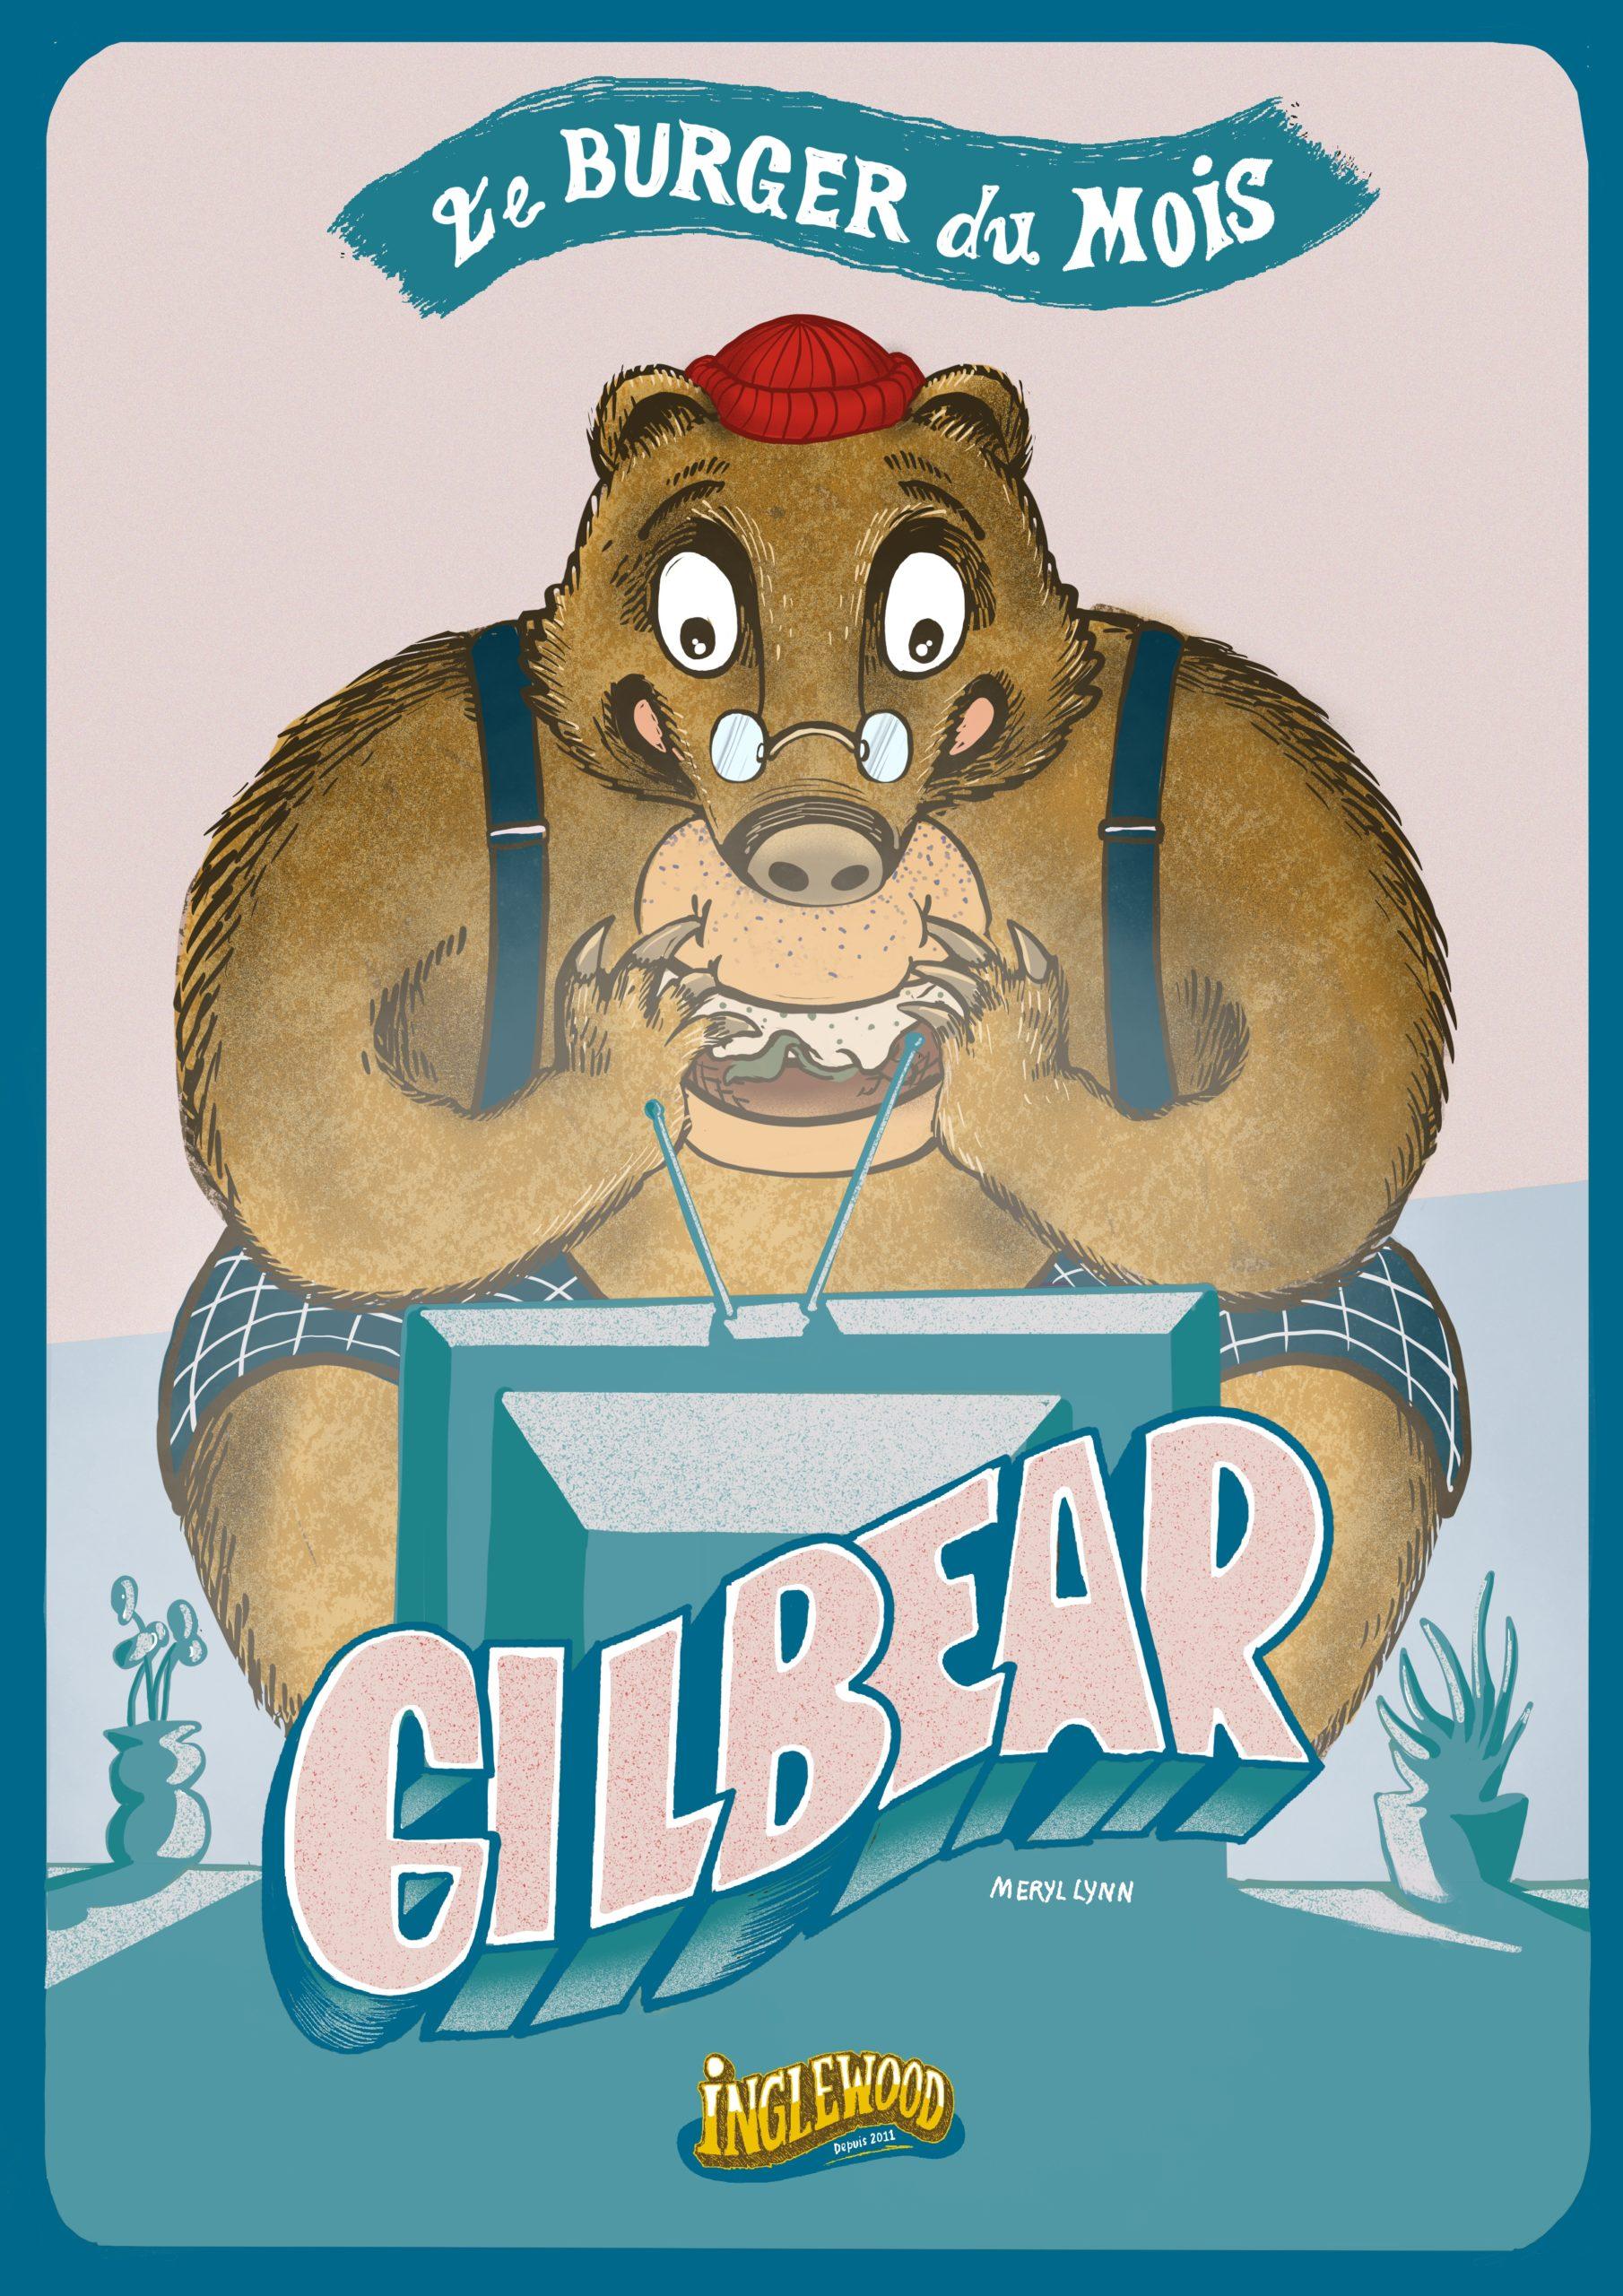 GILBEAR